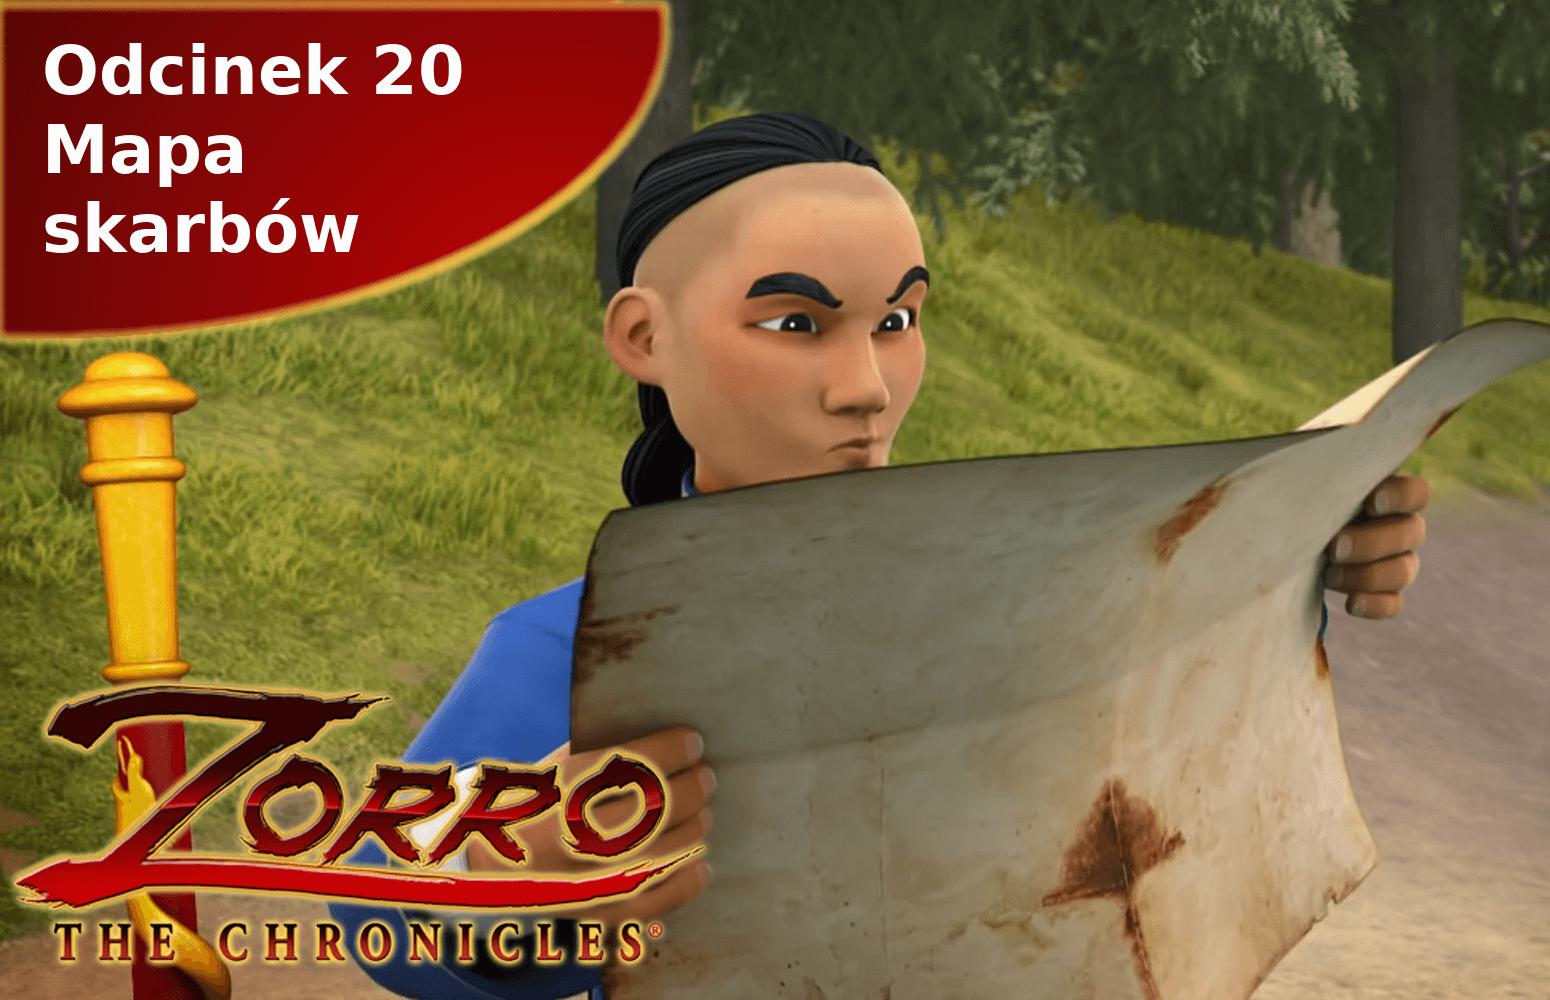 Kroniki Zorro odcinek 20 Mapa skarbów